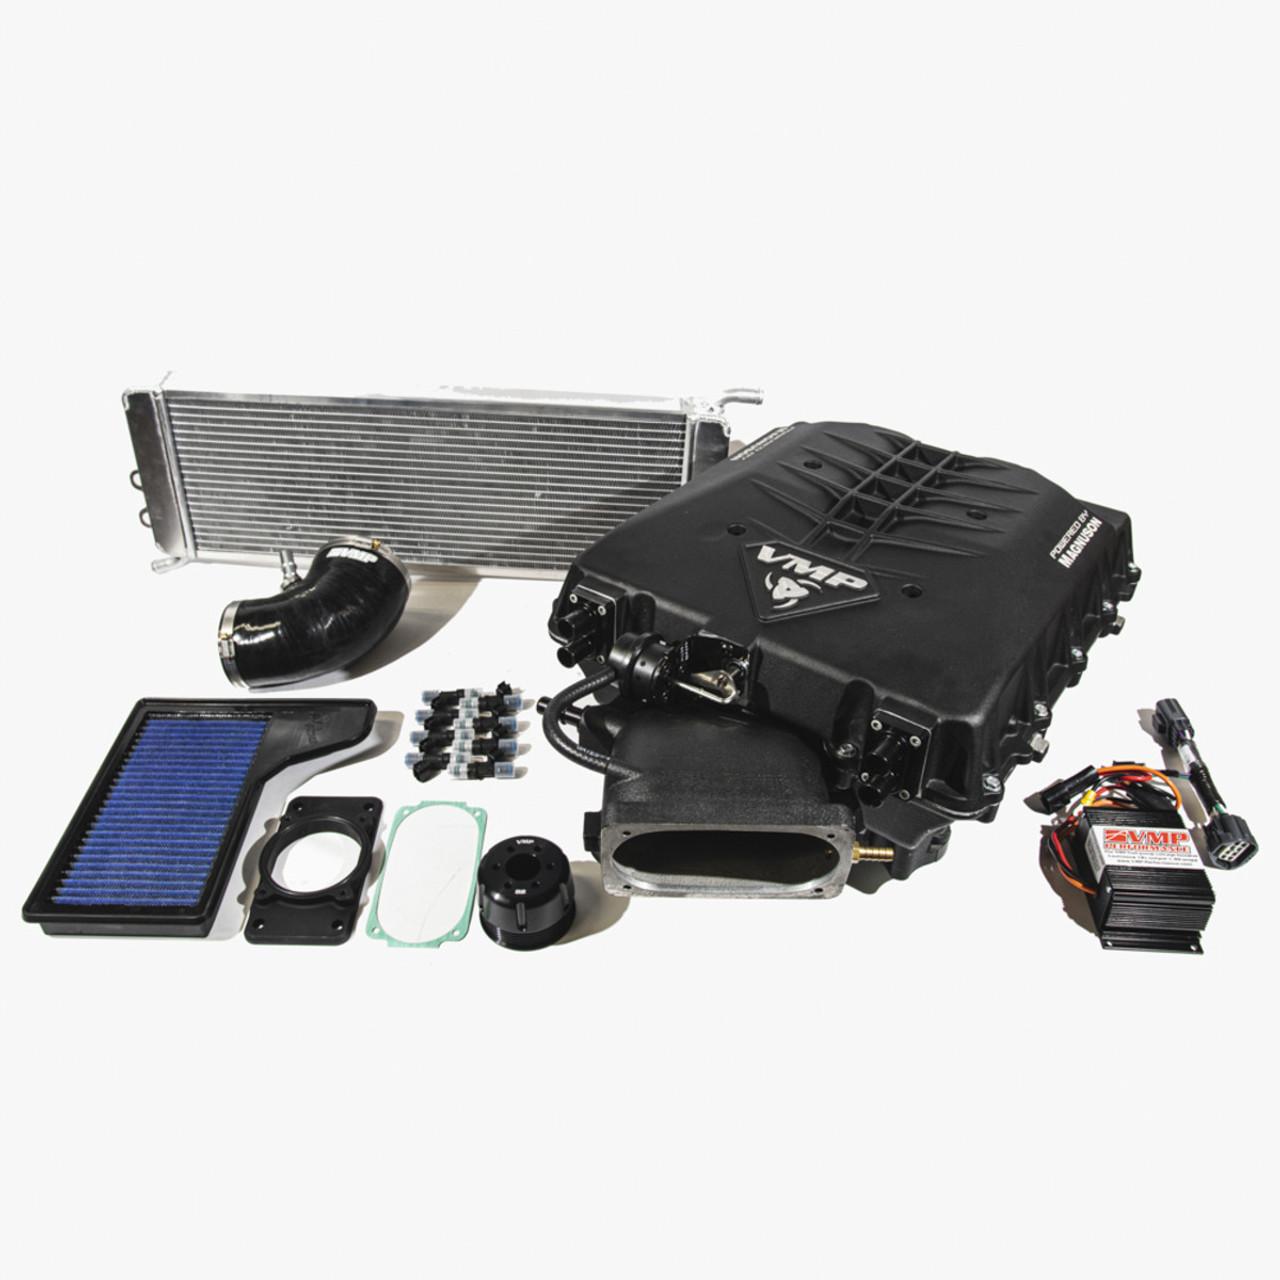 VMP LOKI Supercharger Kit (2018+ F150 5.0L) VMP-SK1820FLOKI